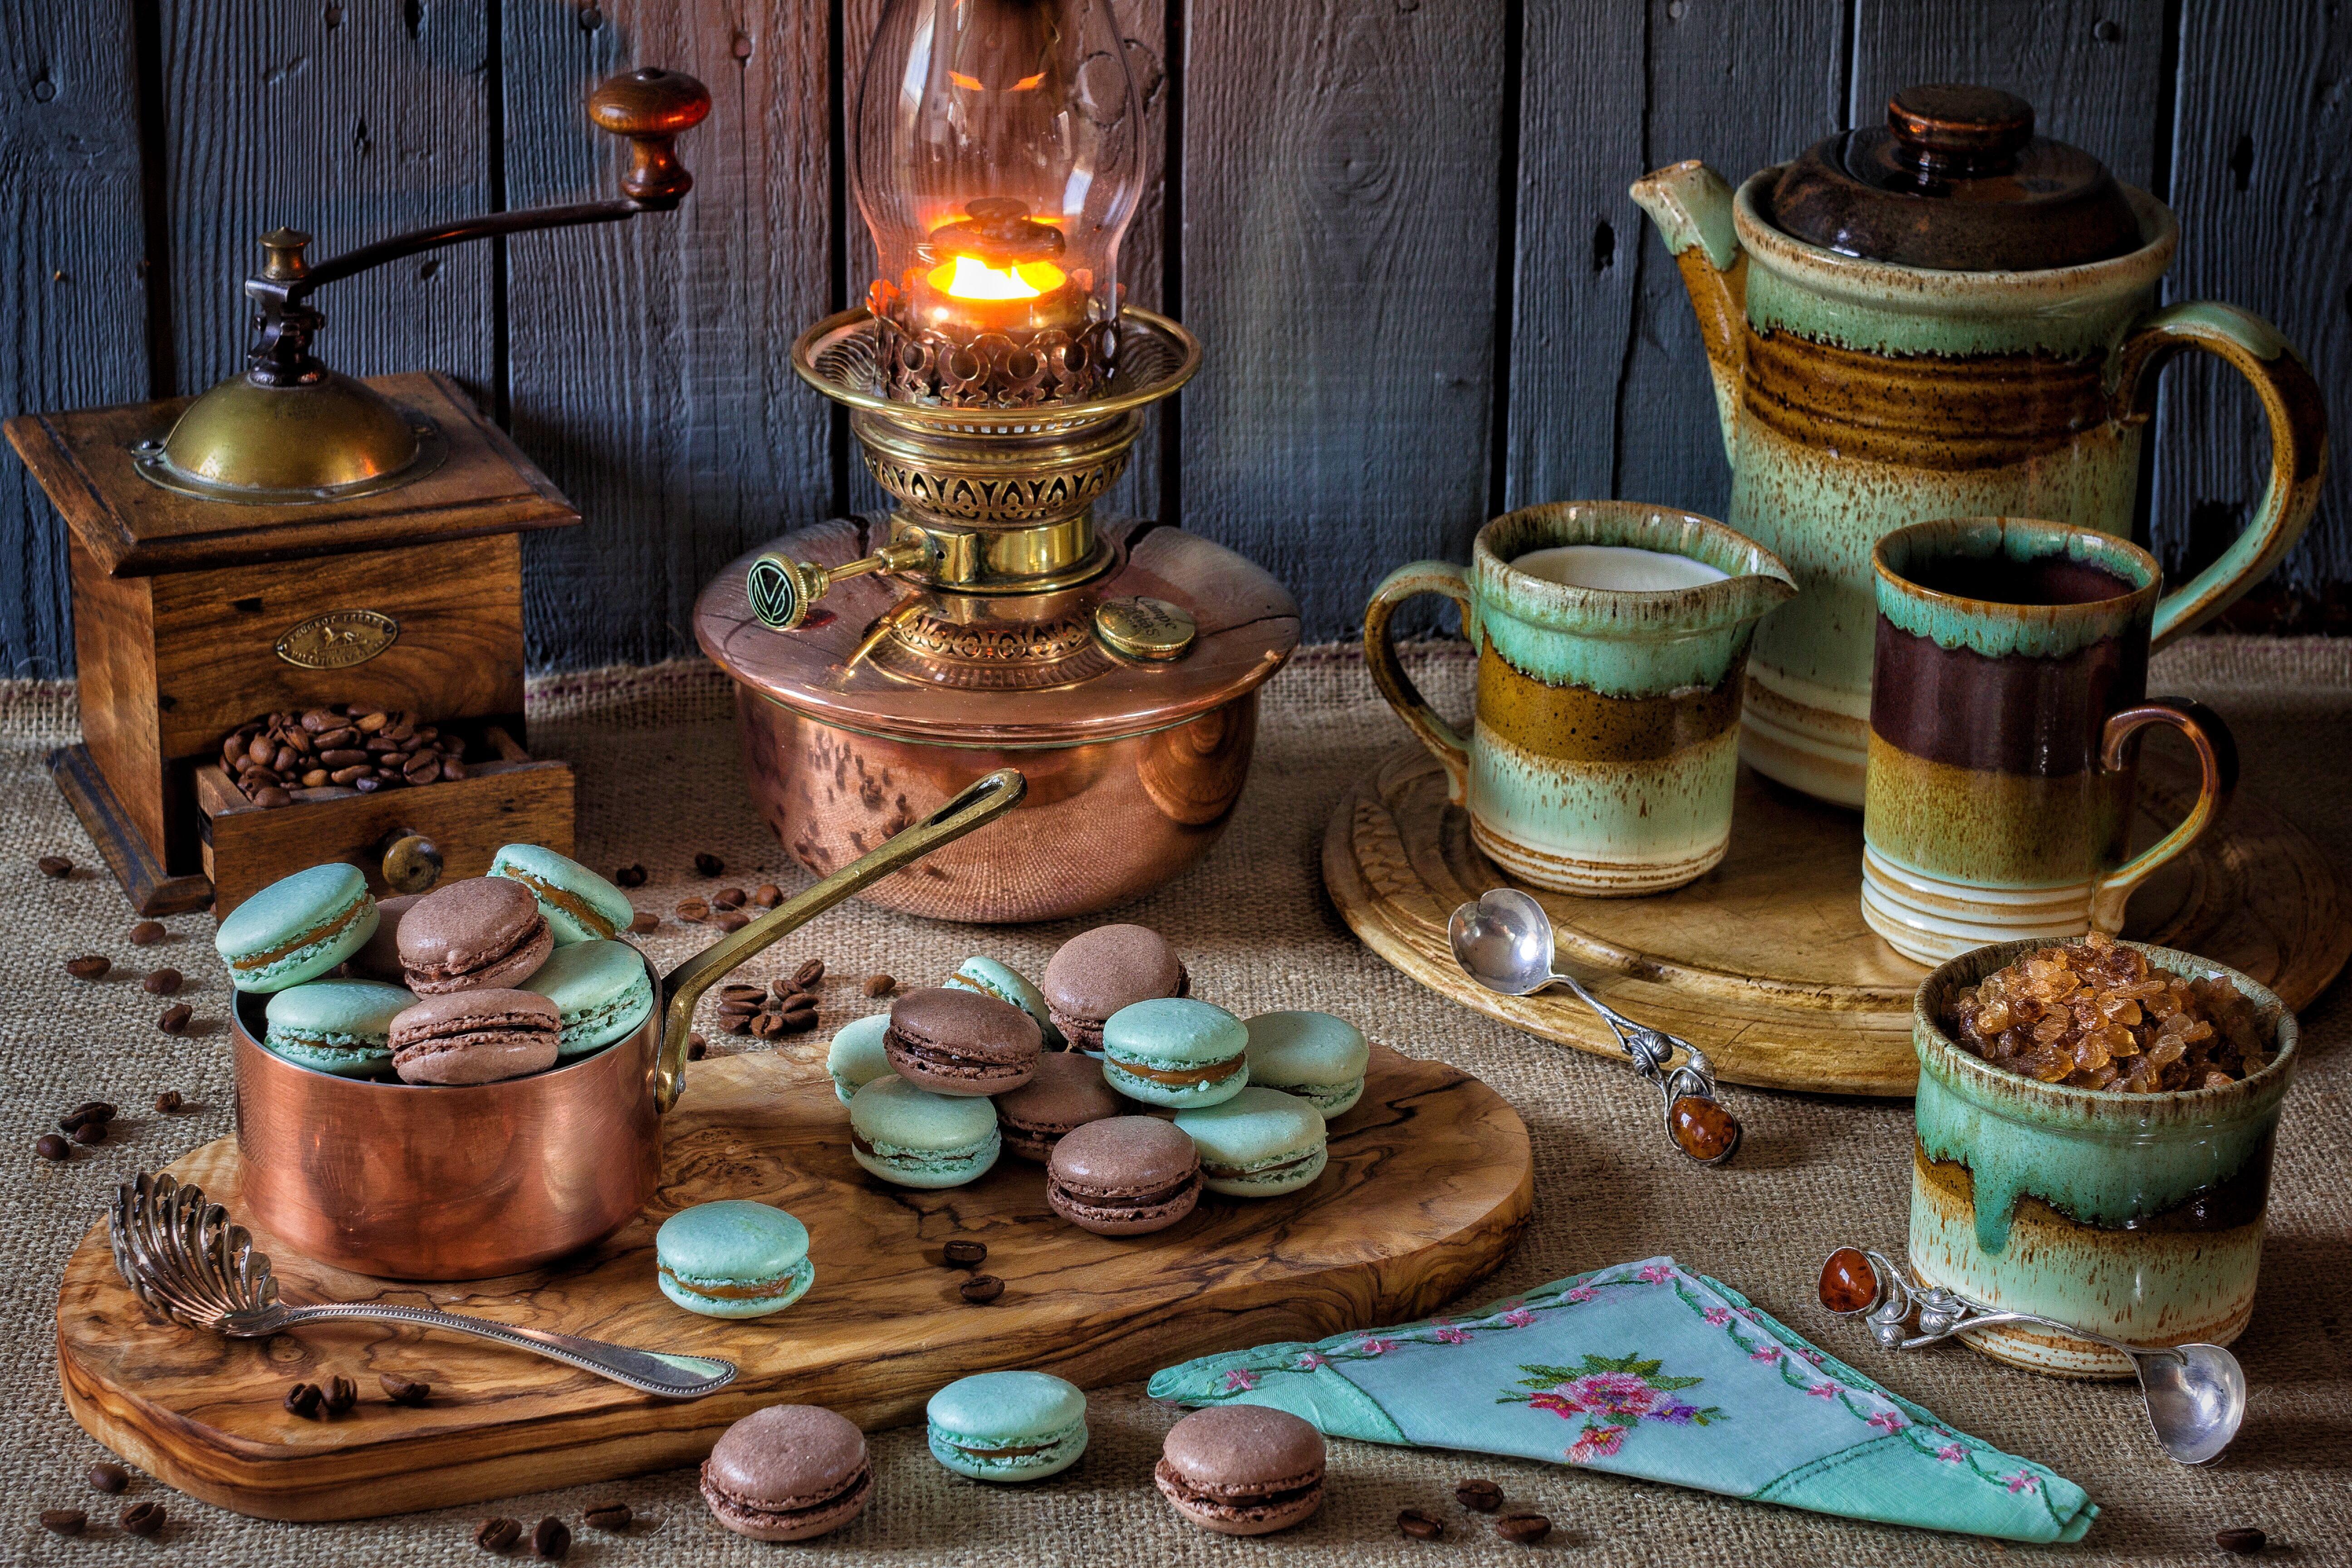 обои стол, лампа, кофемолка, печенье картинки фото